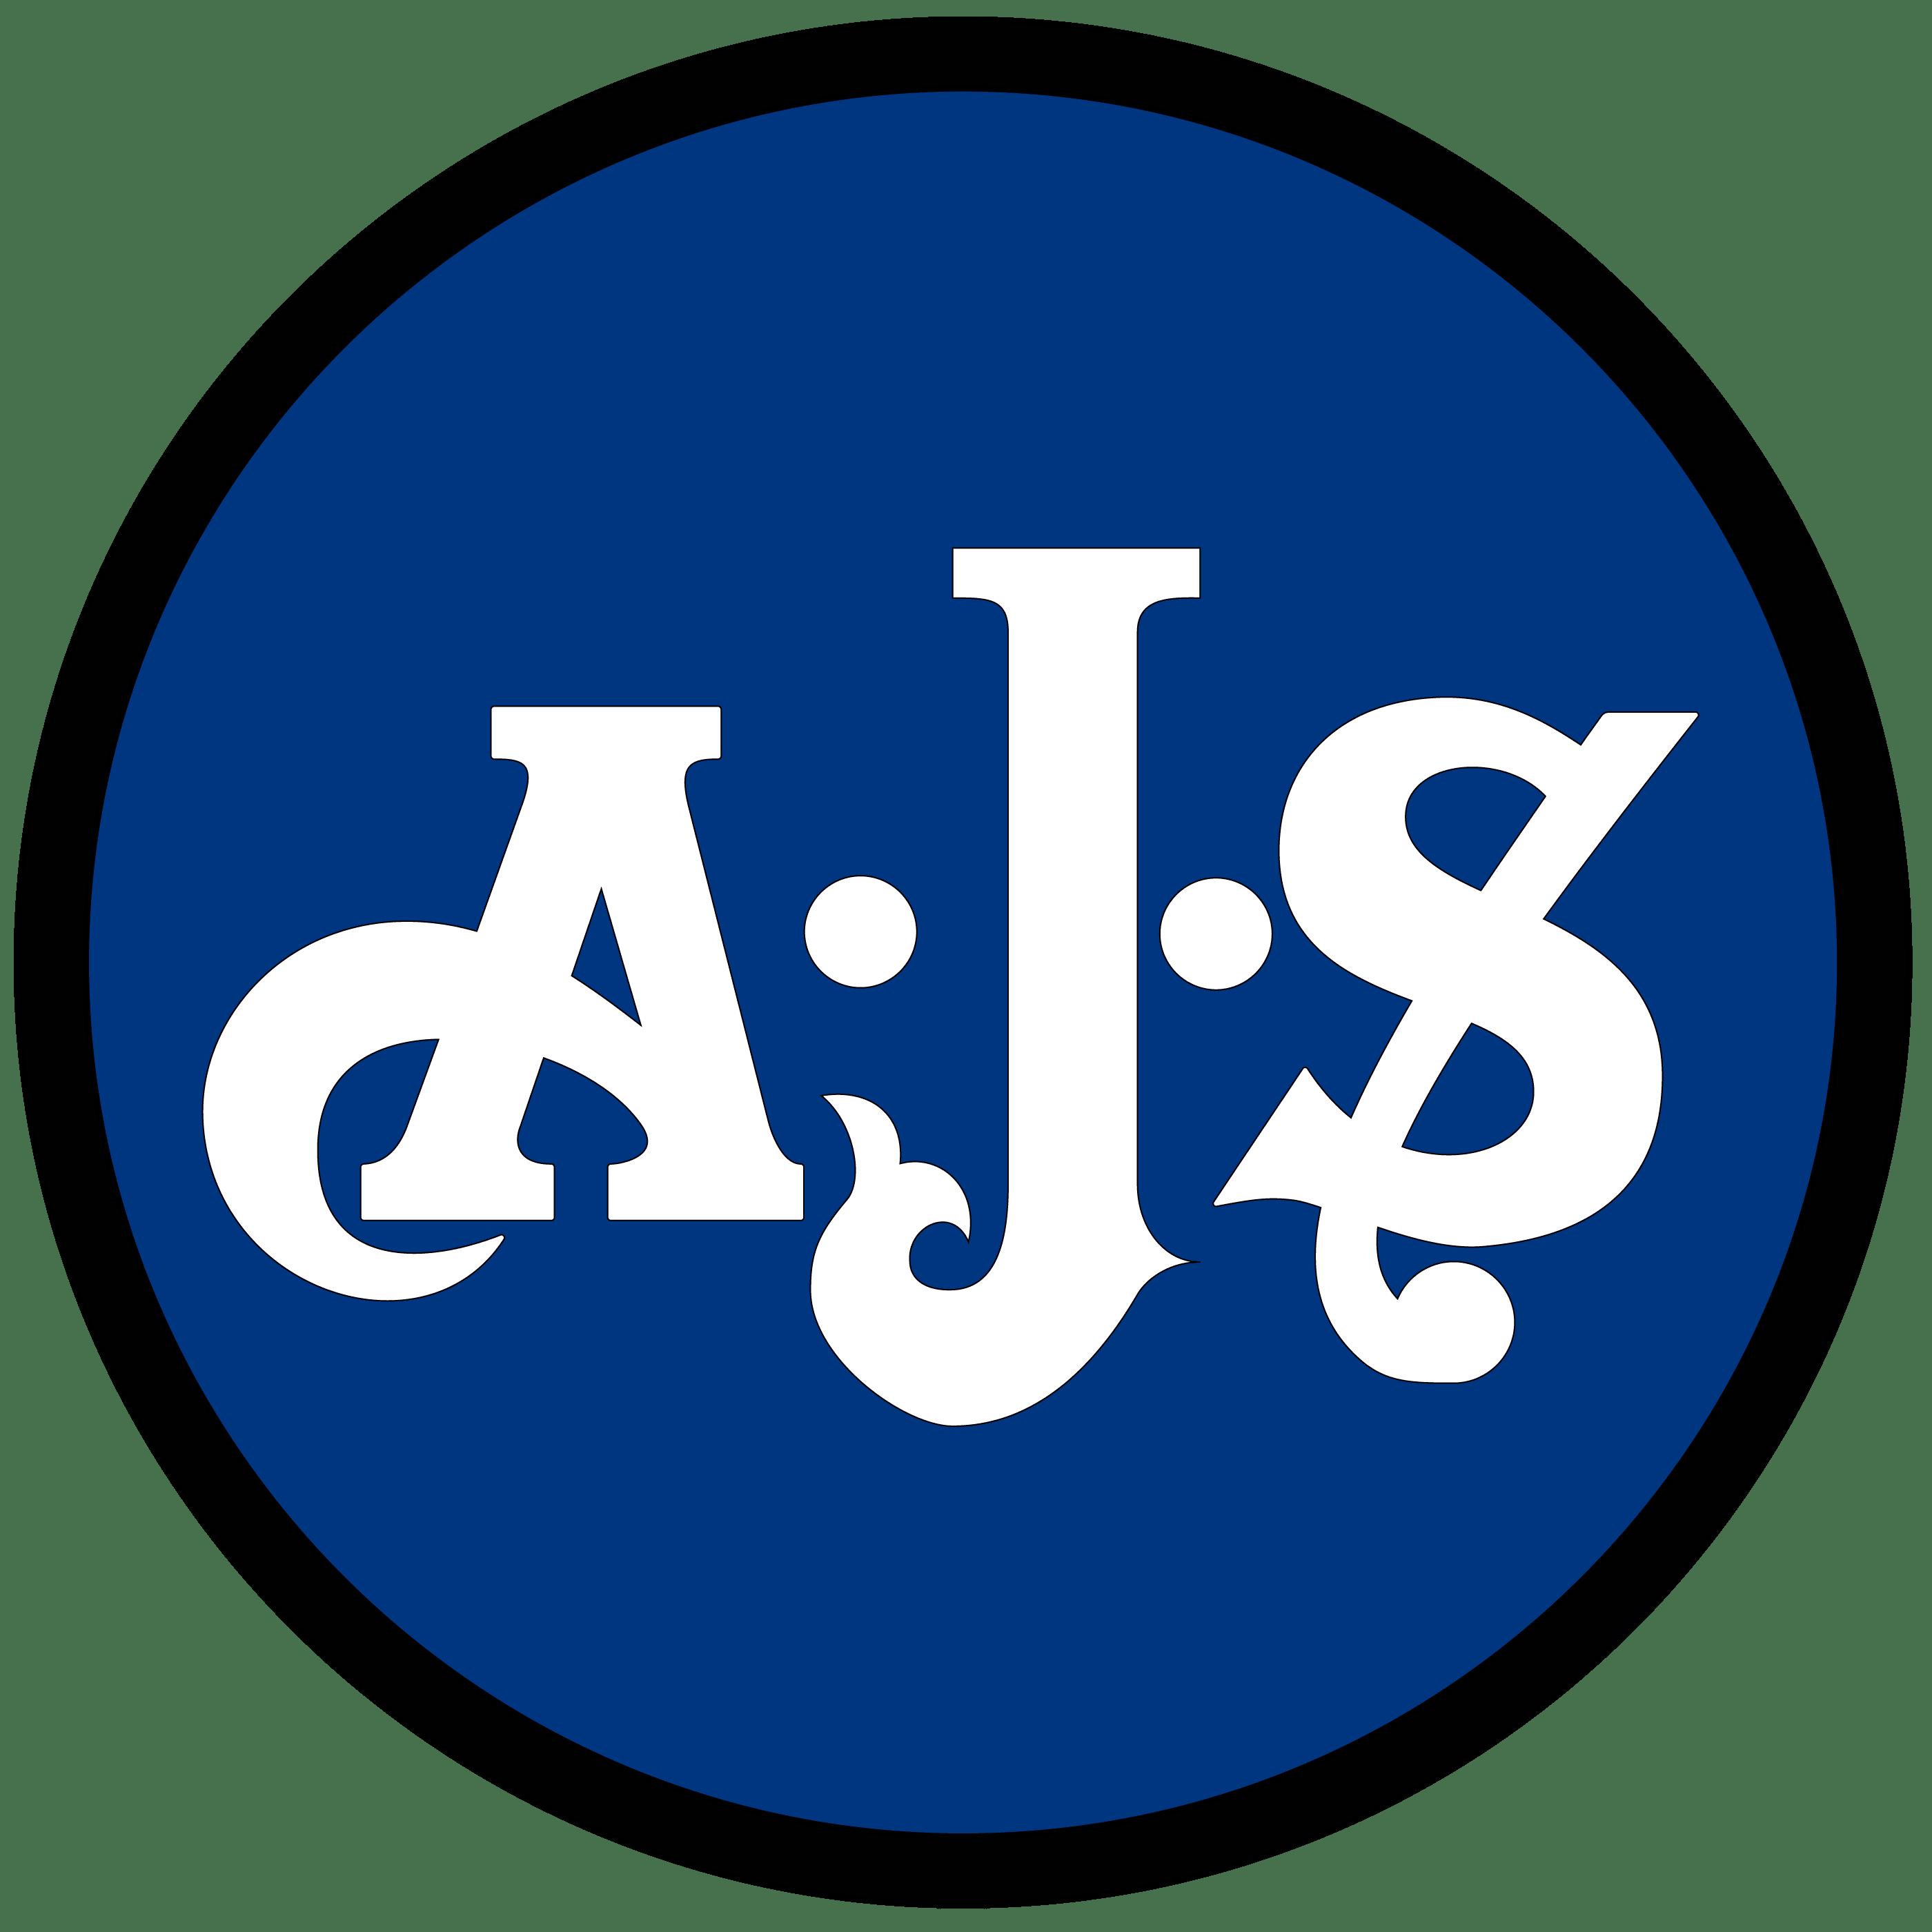 AJS Moto Logo - A J S PNG